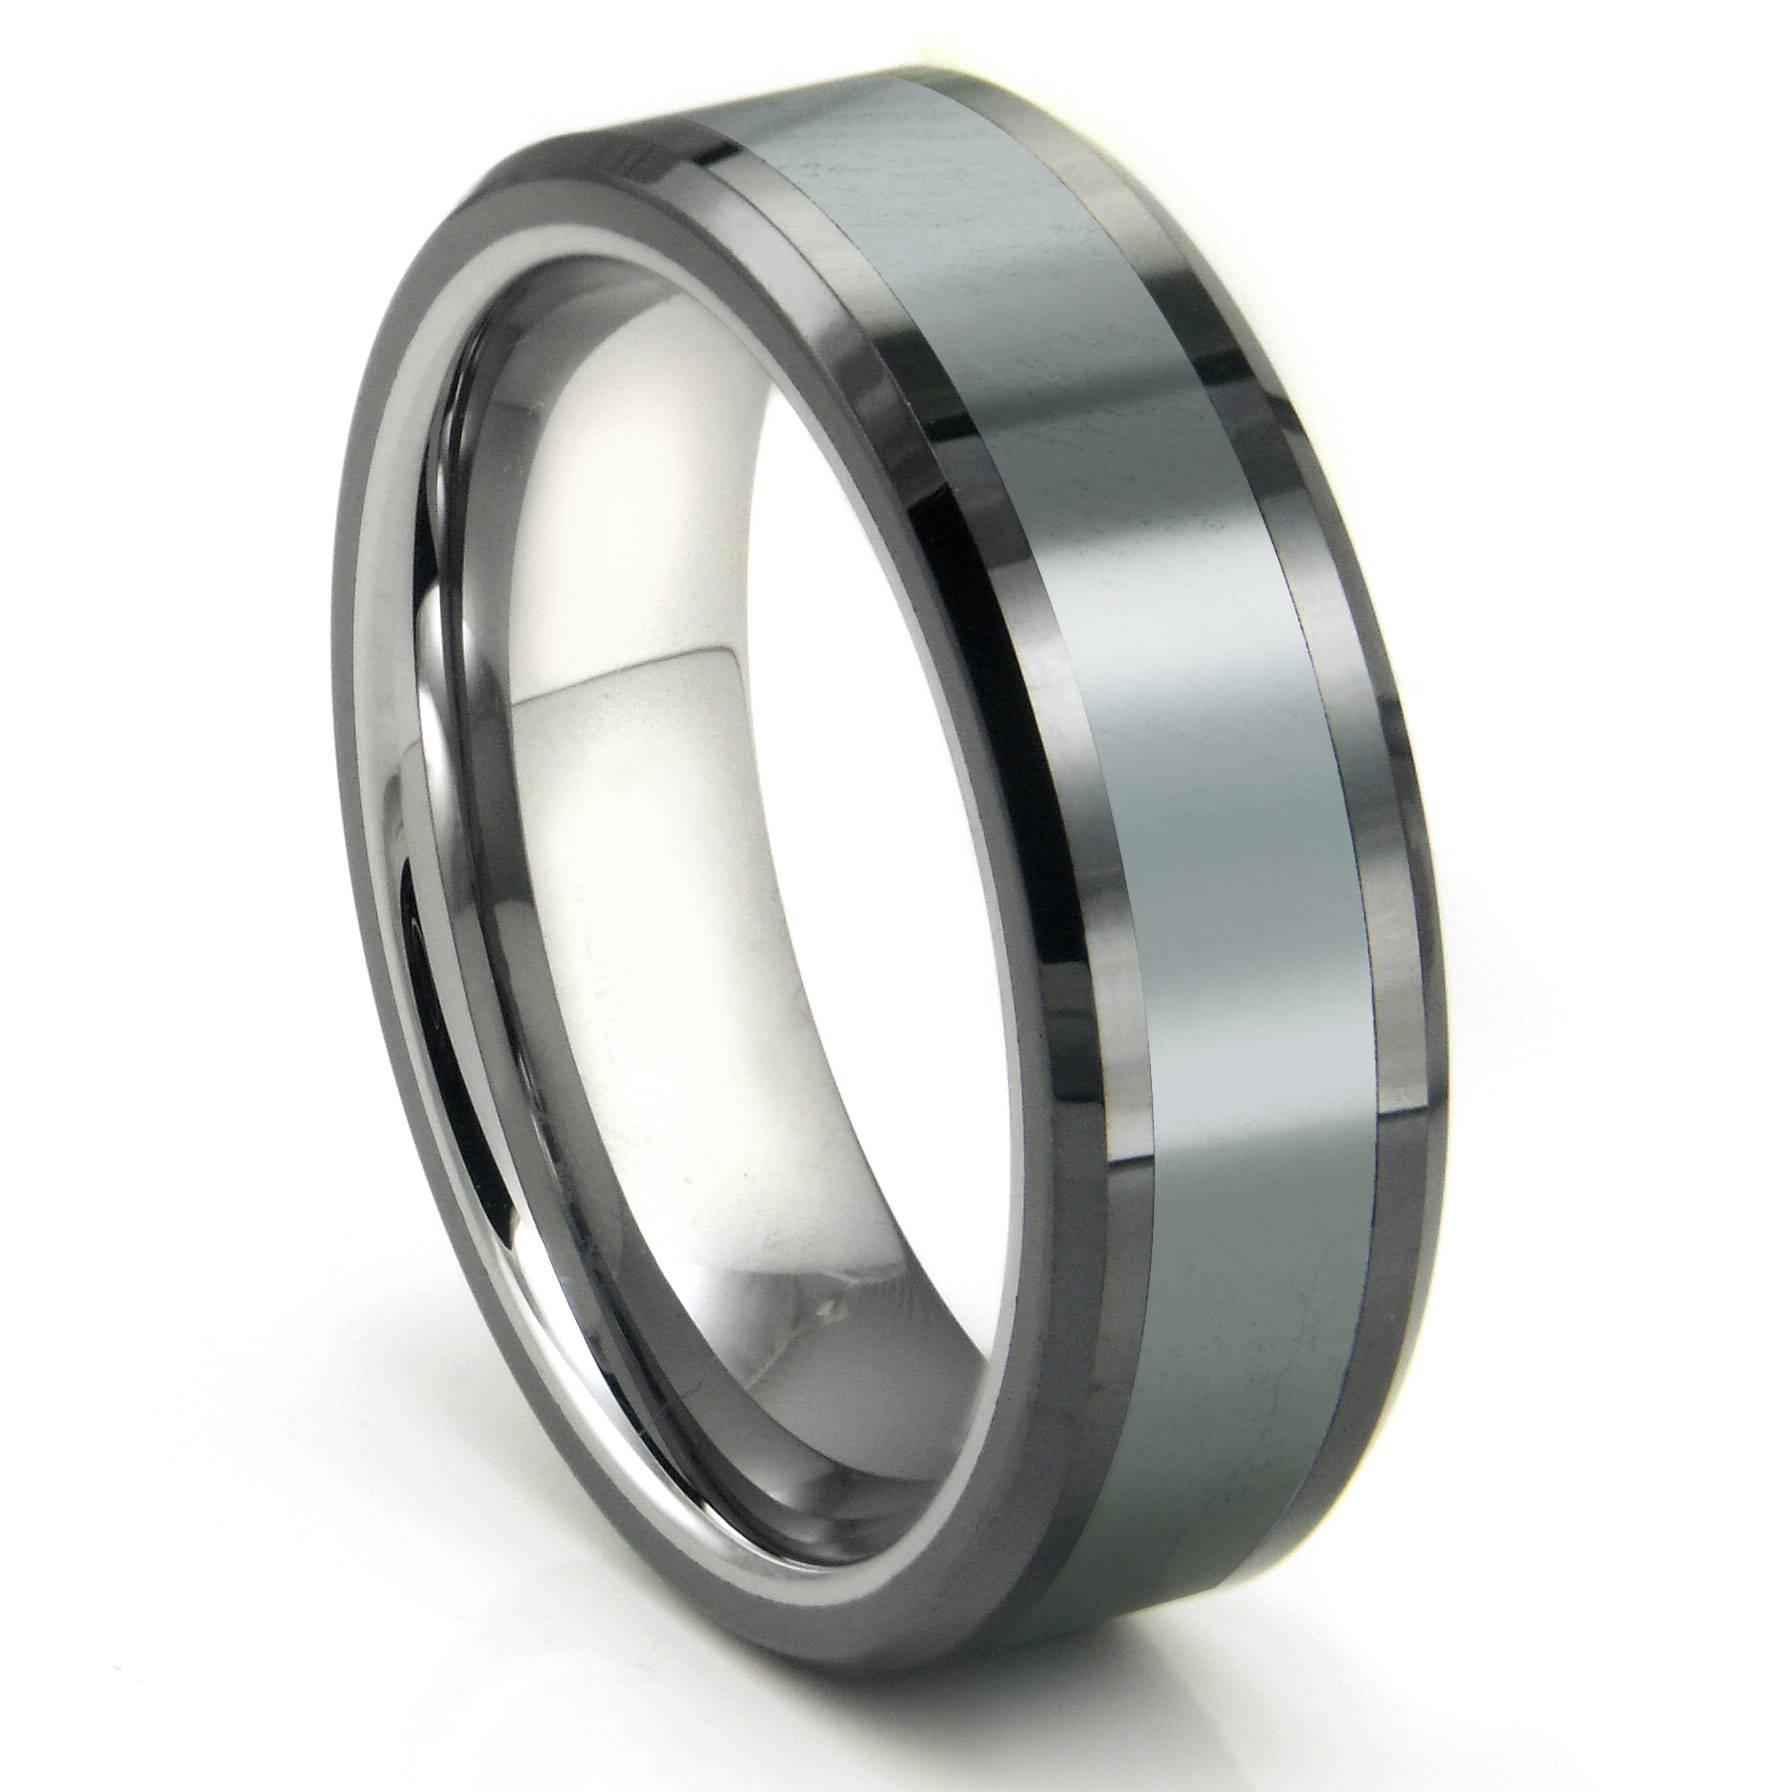 Mens Tungsten Rings & Wedding Bands – Titanium Kay Regarding Non Metal Wedding Bands (View 5 of 15)